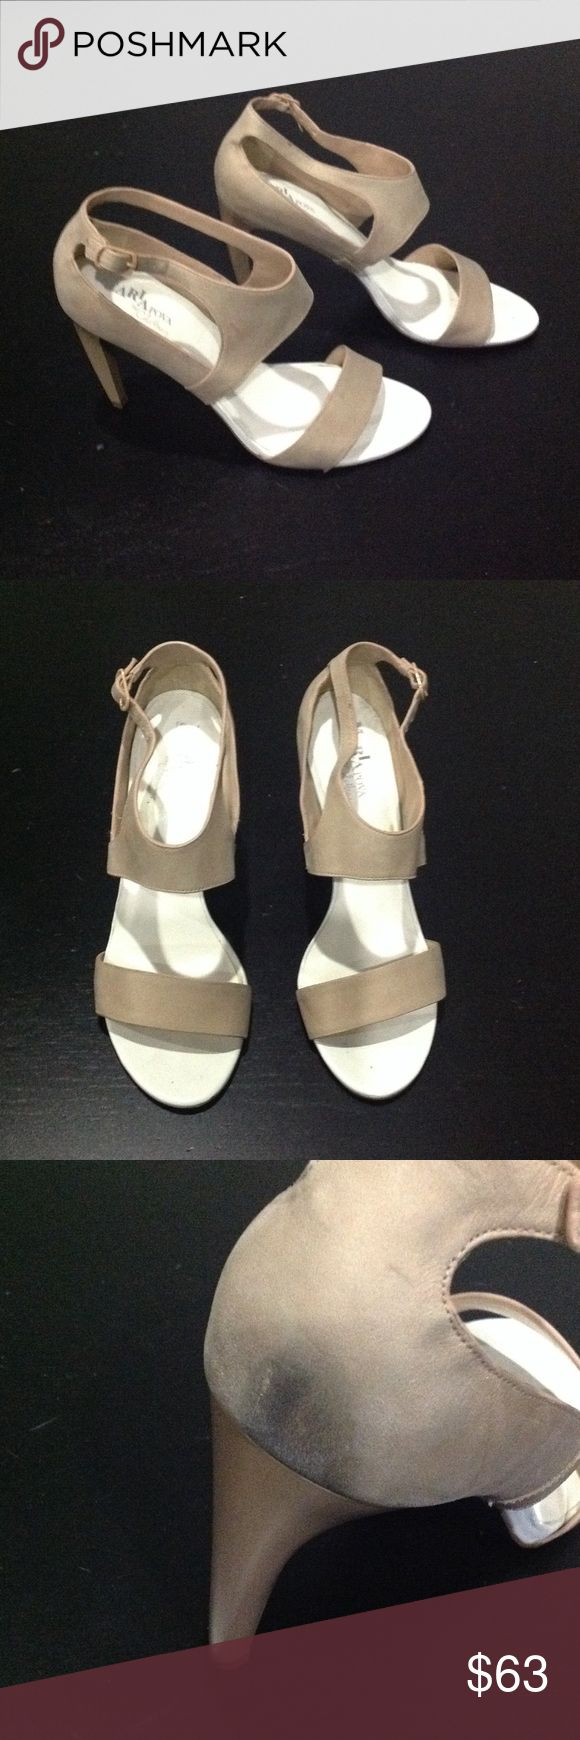 Cole Haan/ Nike Air Tan heels Leather 4 inch heels Cole Haan/ Nike Air Tan heels Cole Haan Shoes Heels